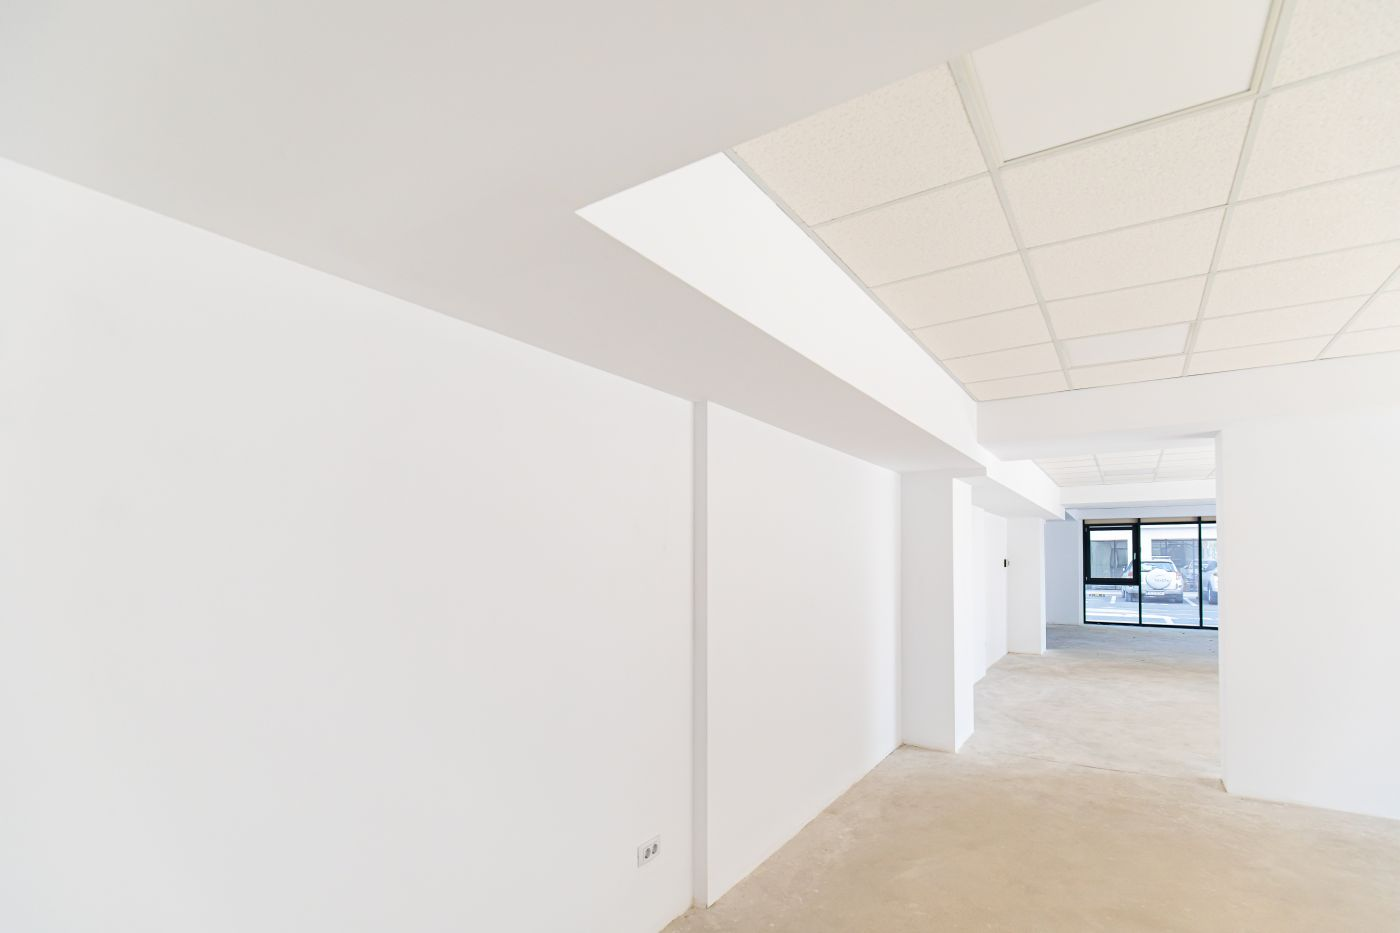 conest-grand-residence-spatii-comerciale-de-inchiriat-iasi-cgr-05